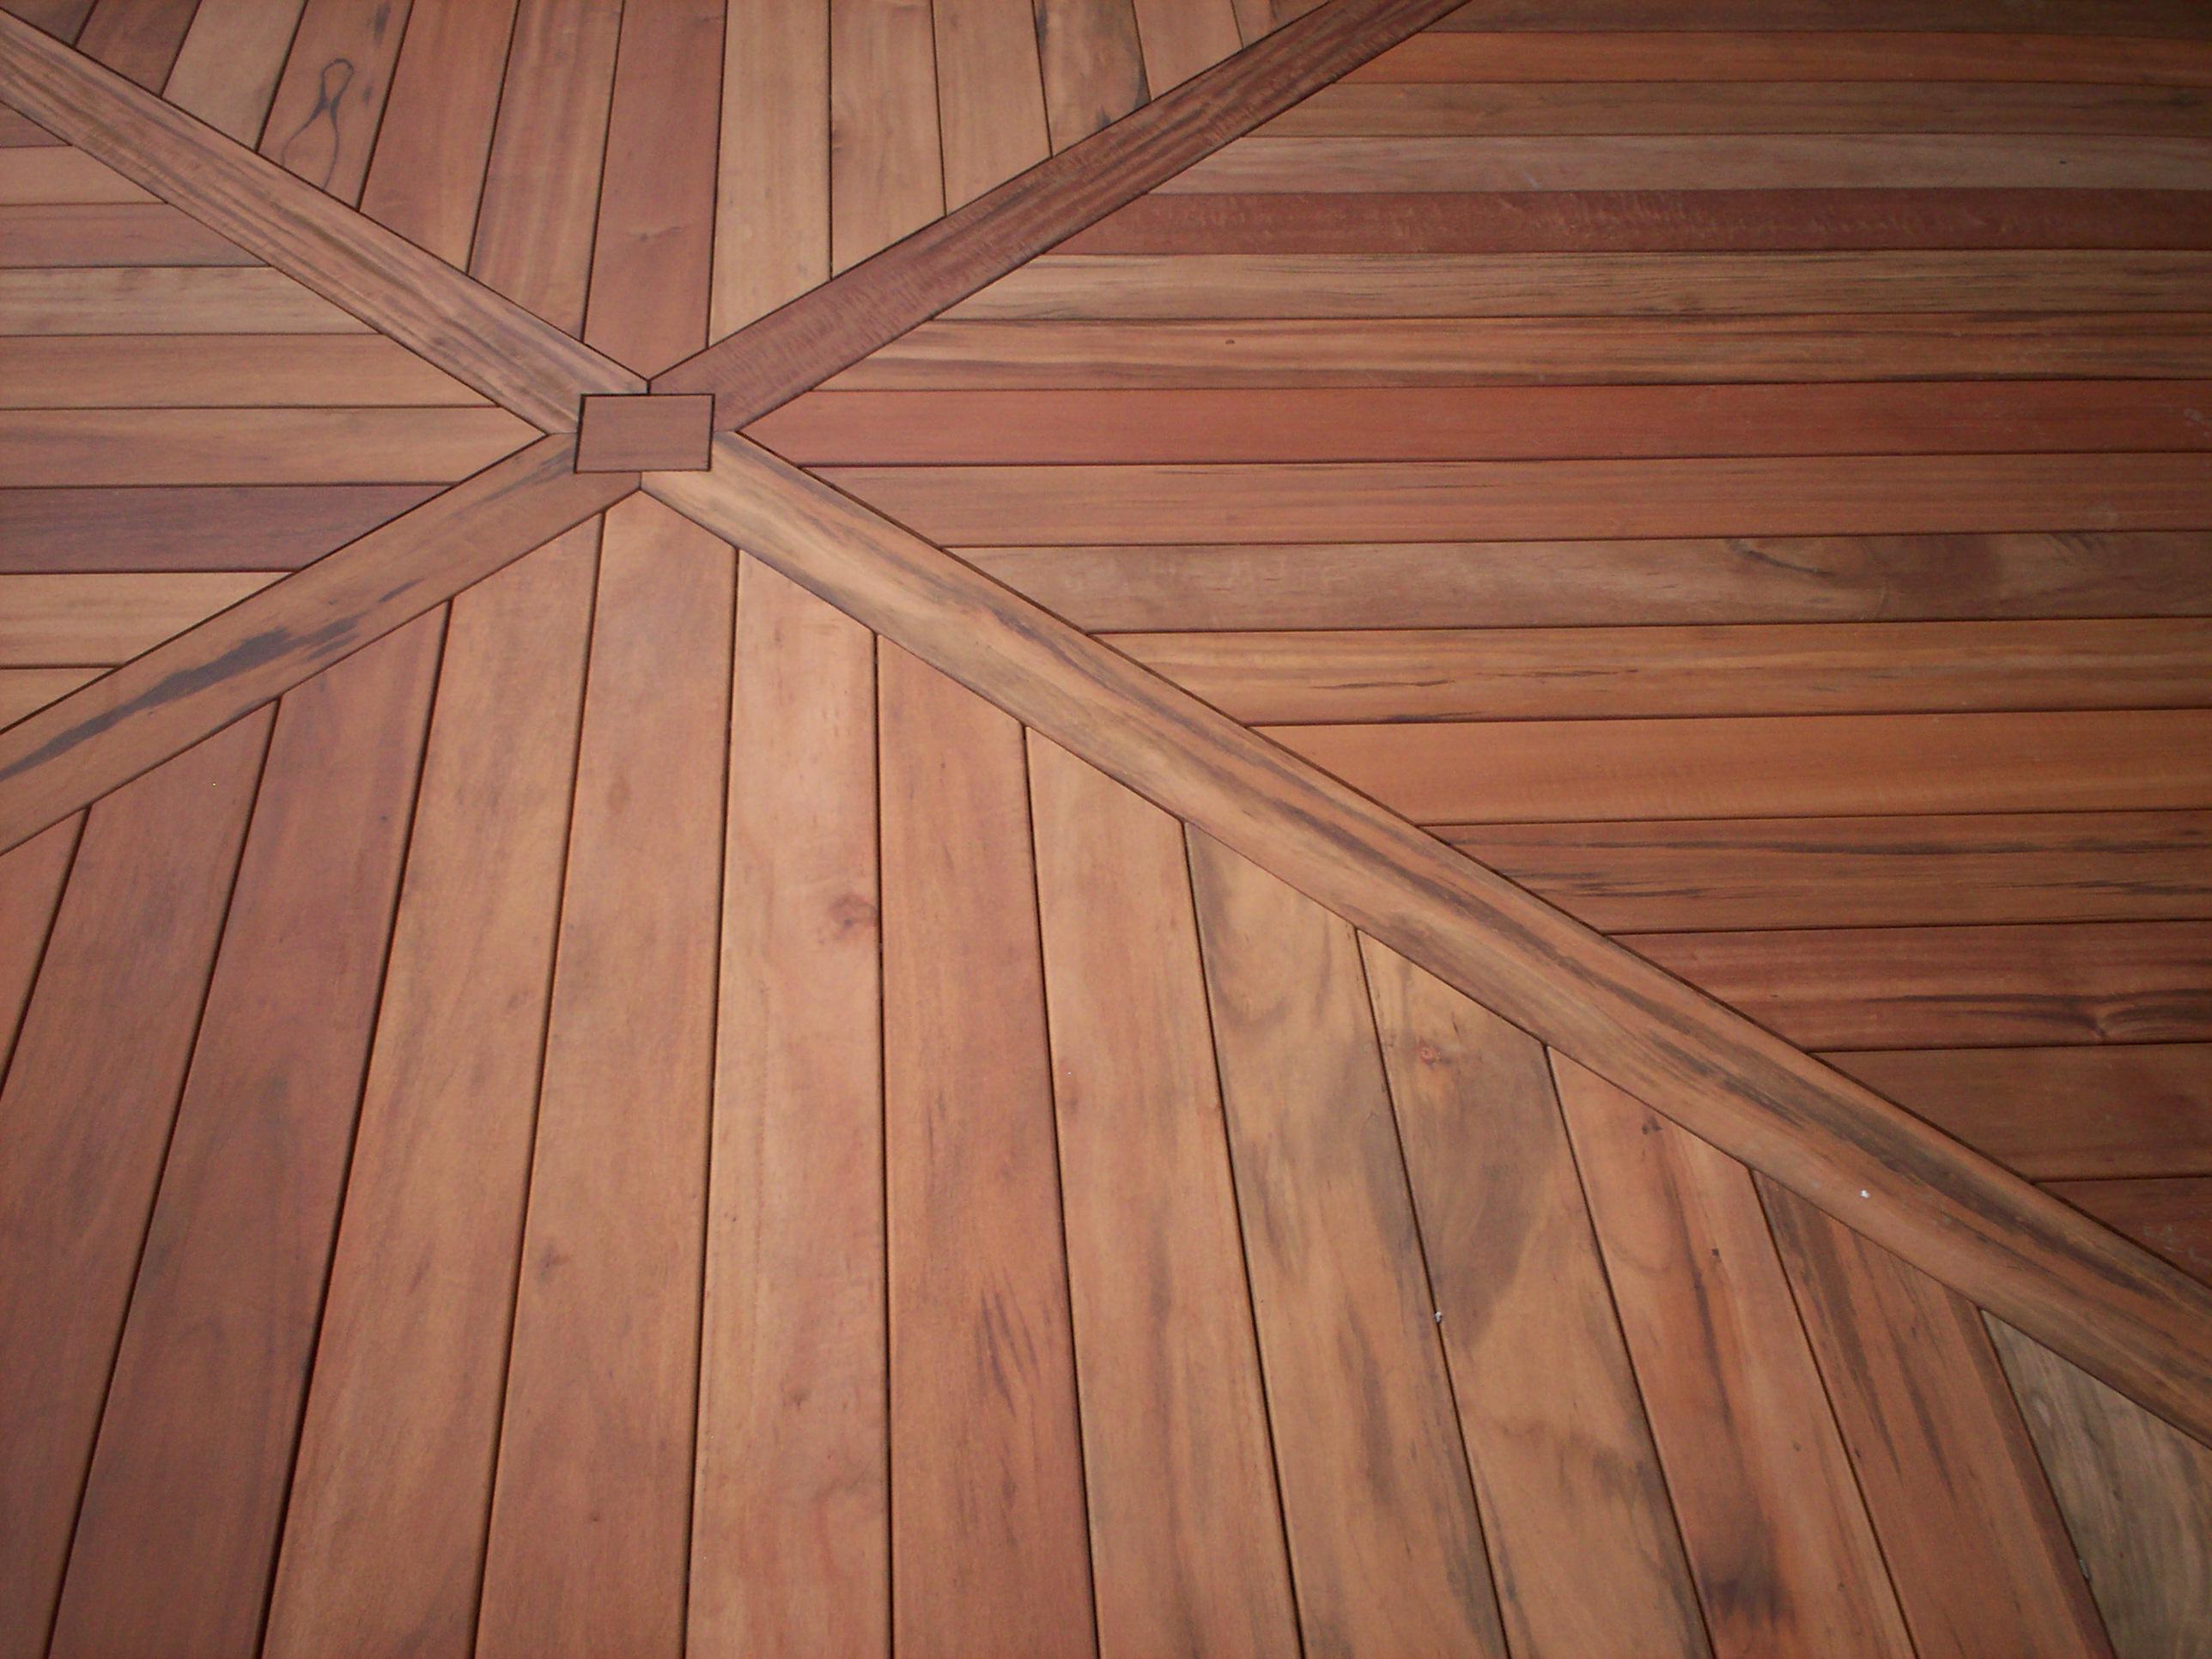 St Louis Deck Designs with Floor Board Patterns  St